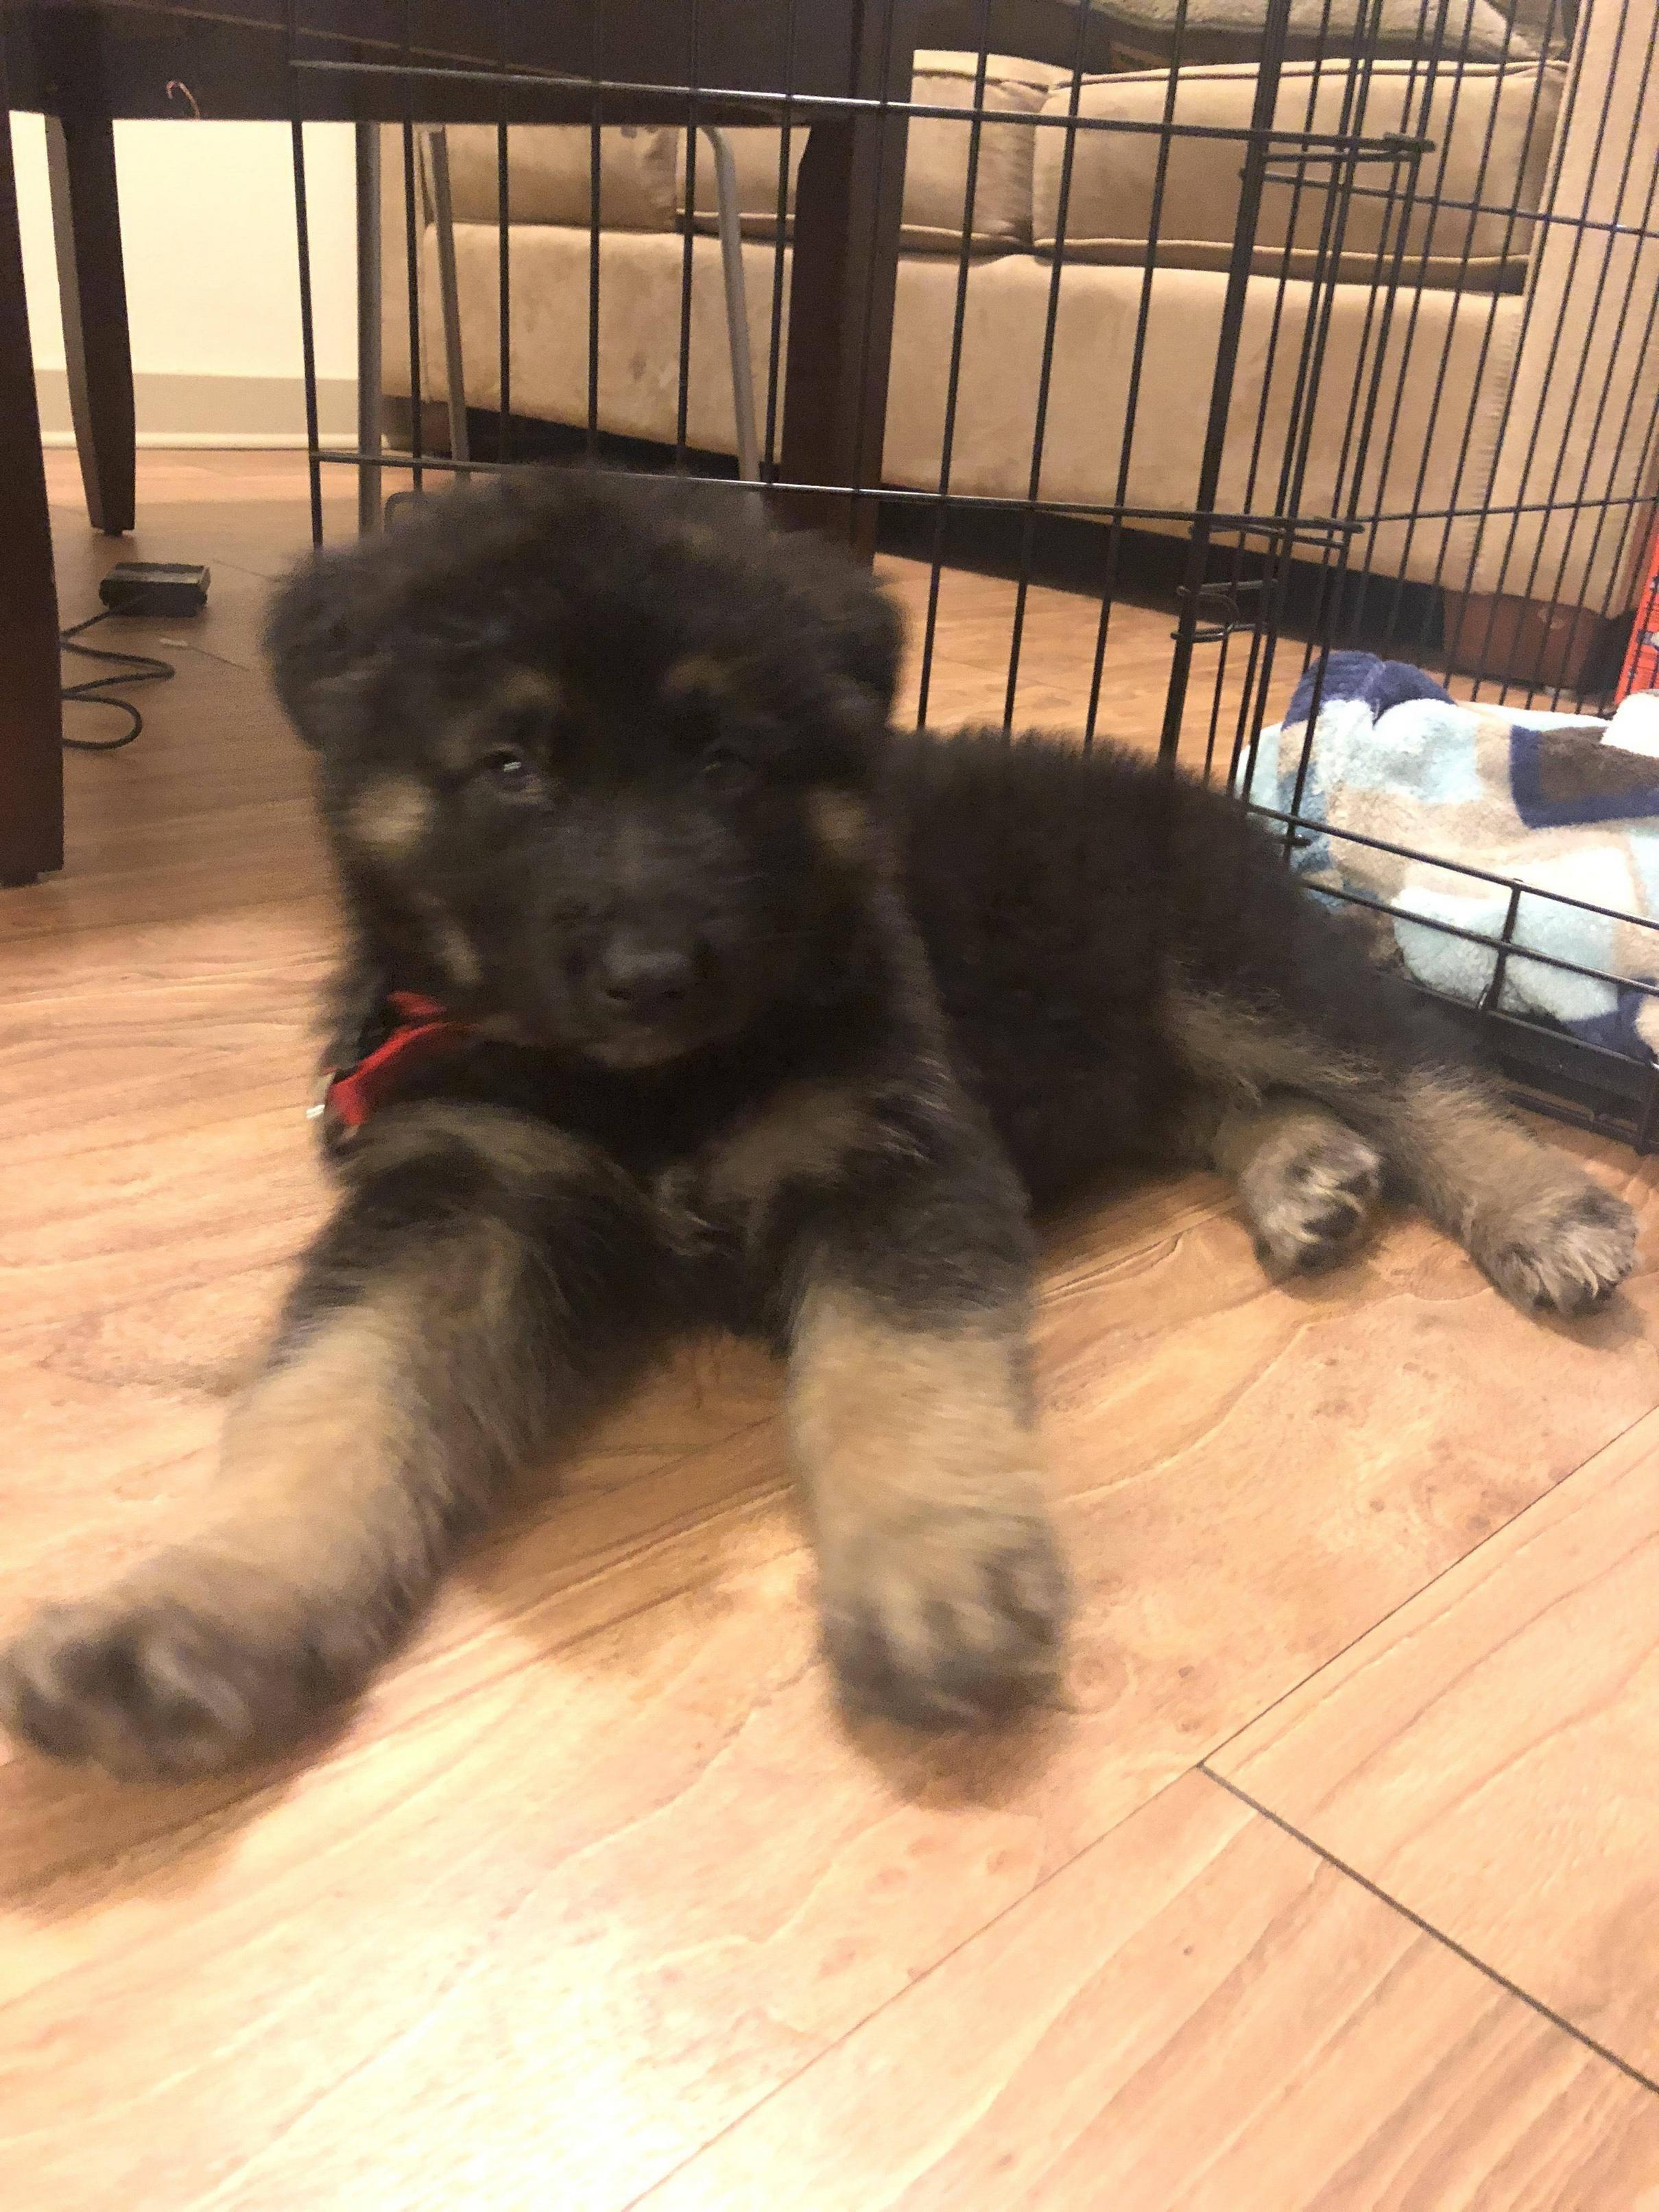 King Shepherd Puppies For Sale In Sri Lanka 2021